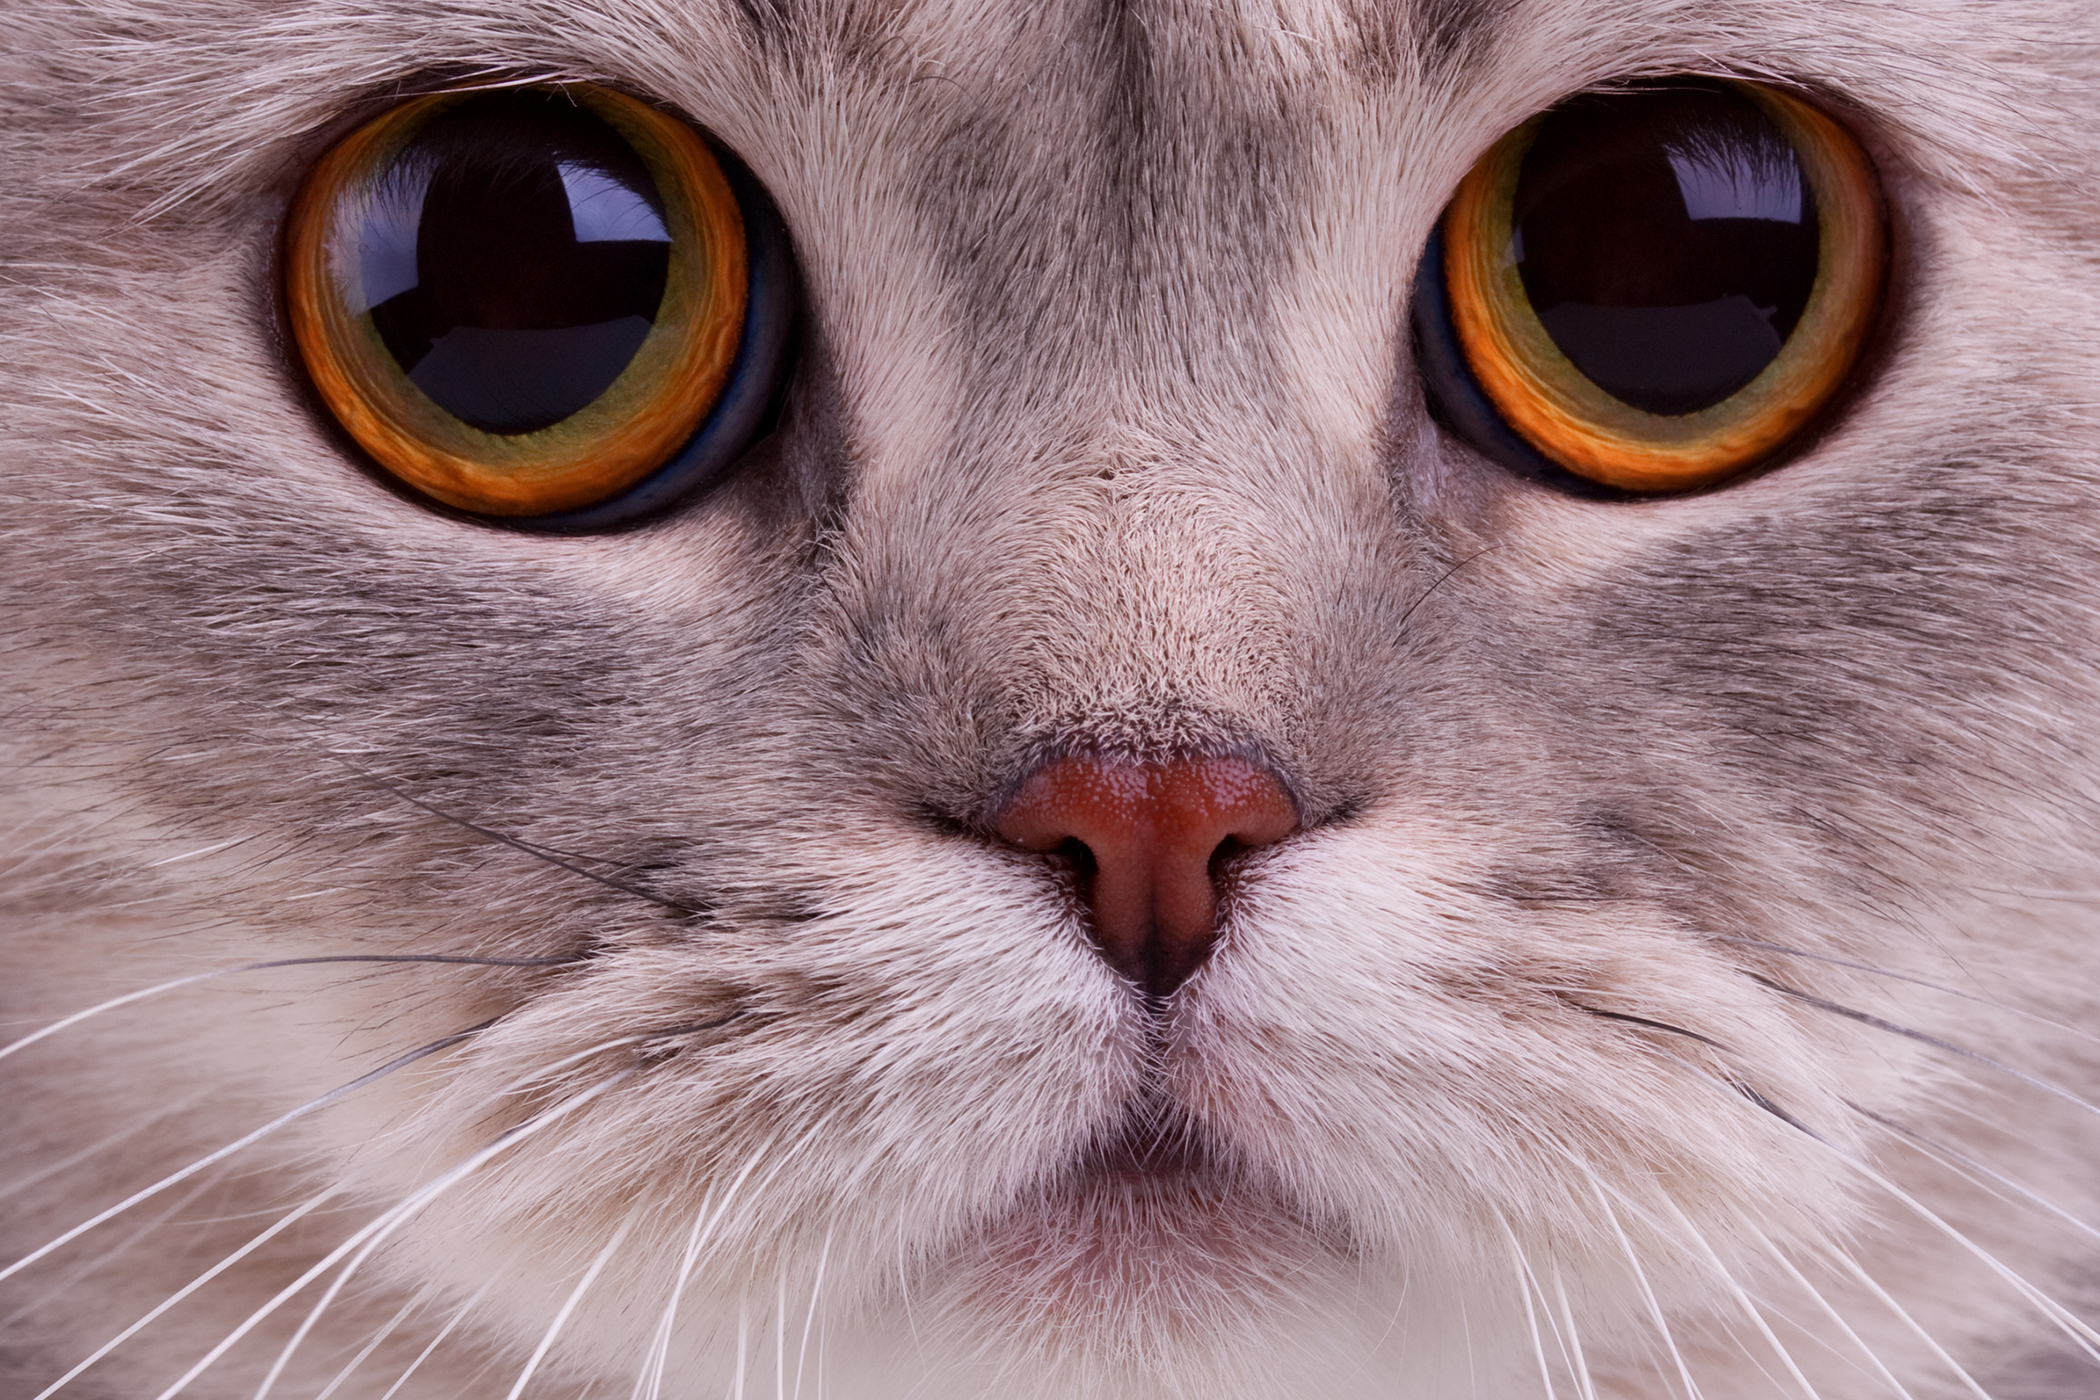 Nonulcerative Keratitis in Cats